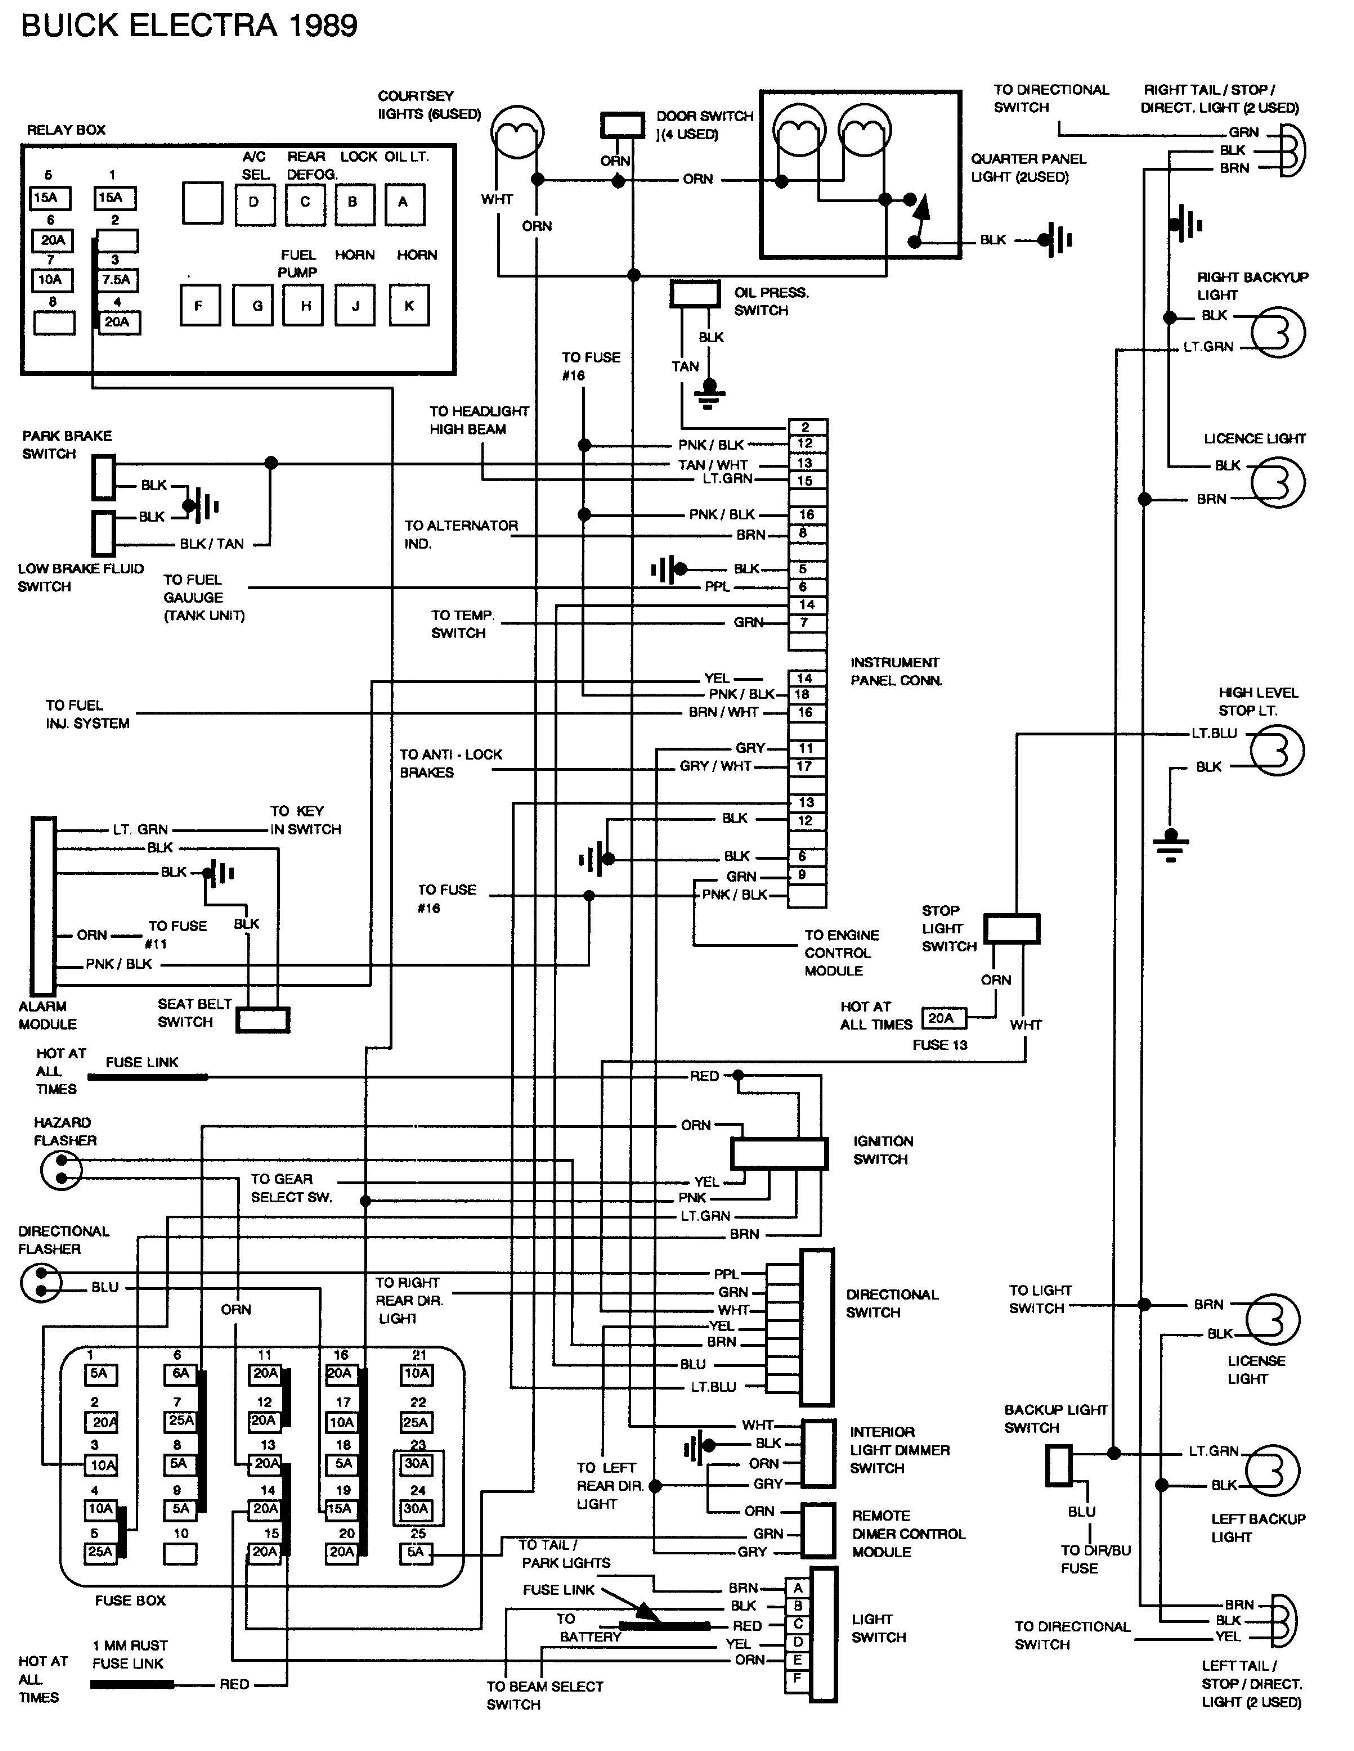 1999 Buick Century Engine Diagram 1999 Buick Riviera Black Pack Fuse Box Diagram Wiring Diagrams • Of 1999 Buick Century Engine Diagram